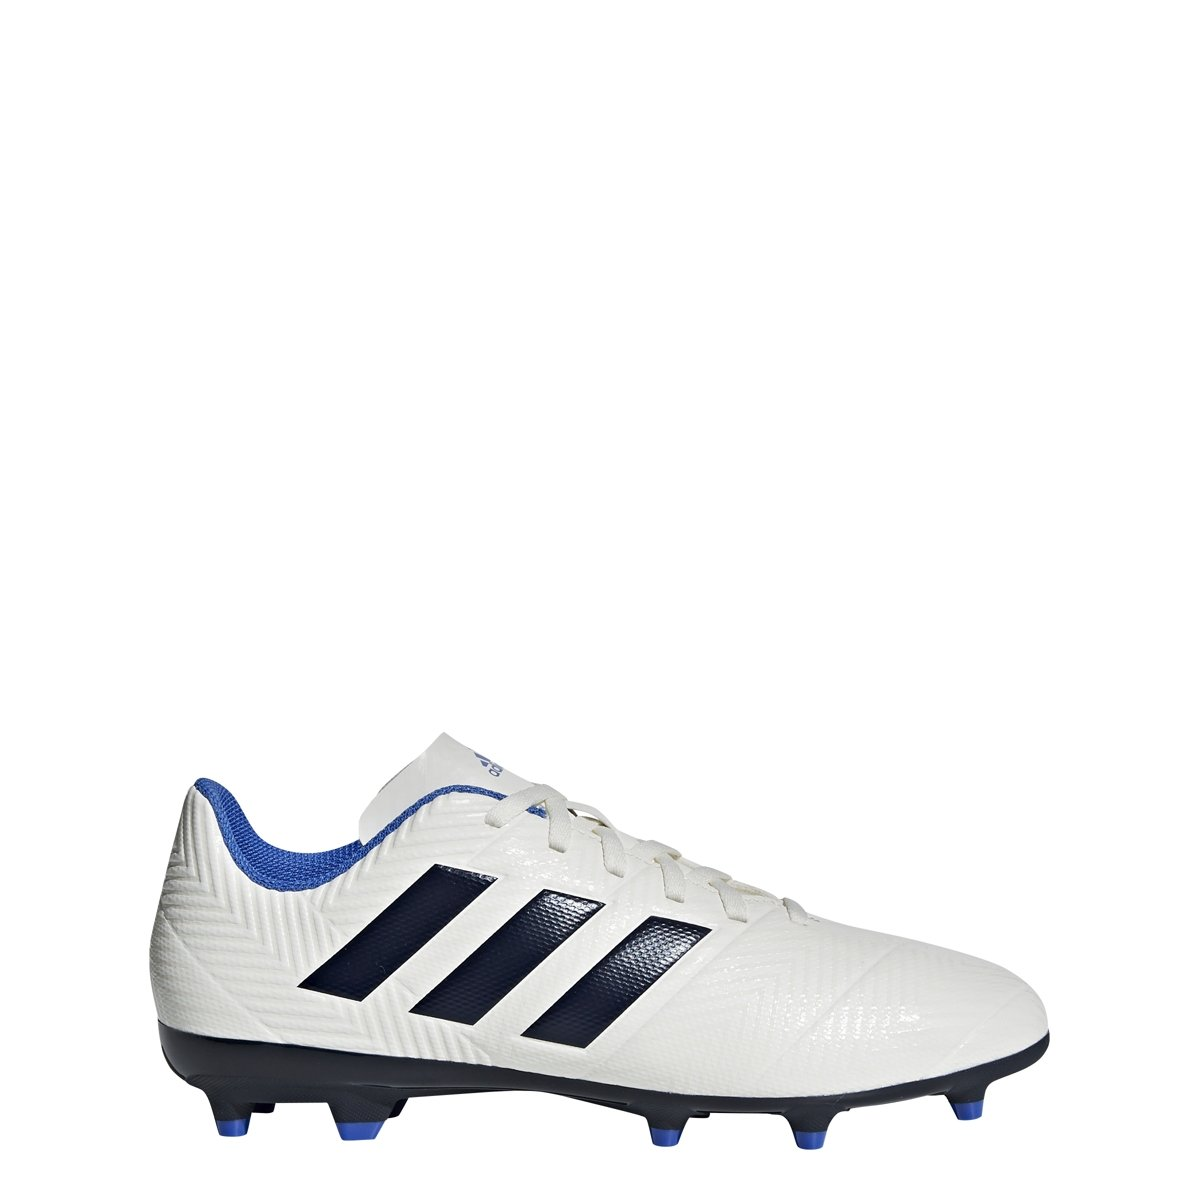 adidas Women's Nemeziz 18.4 Firm Ground Soccer Shoe, Off White/Legend Ink/Hi-Res Blue, 8 M US